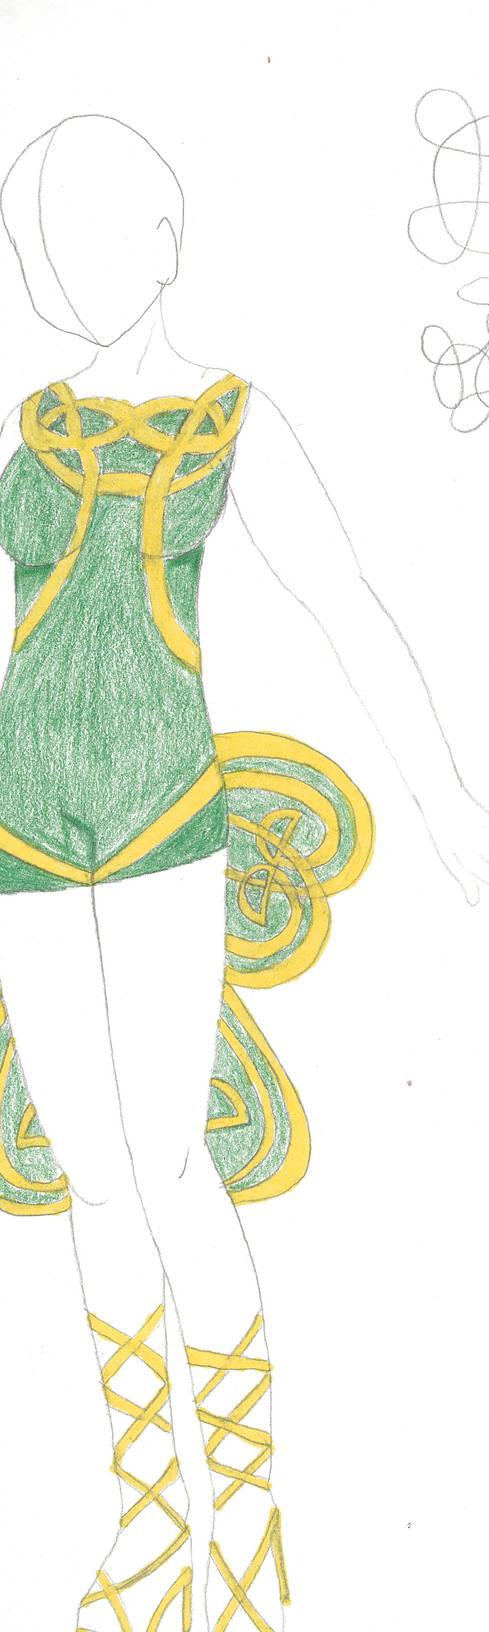 Shamrock Dress (First Draft version)